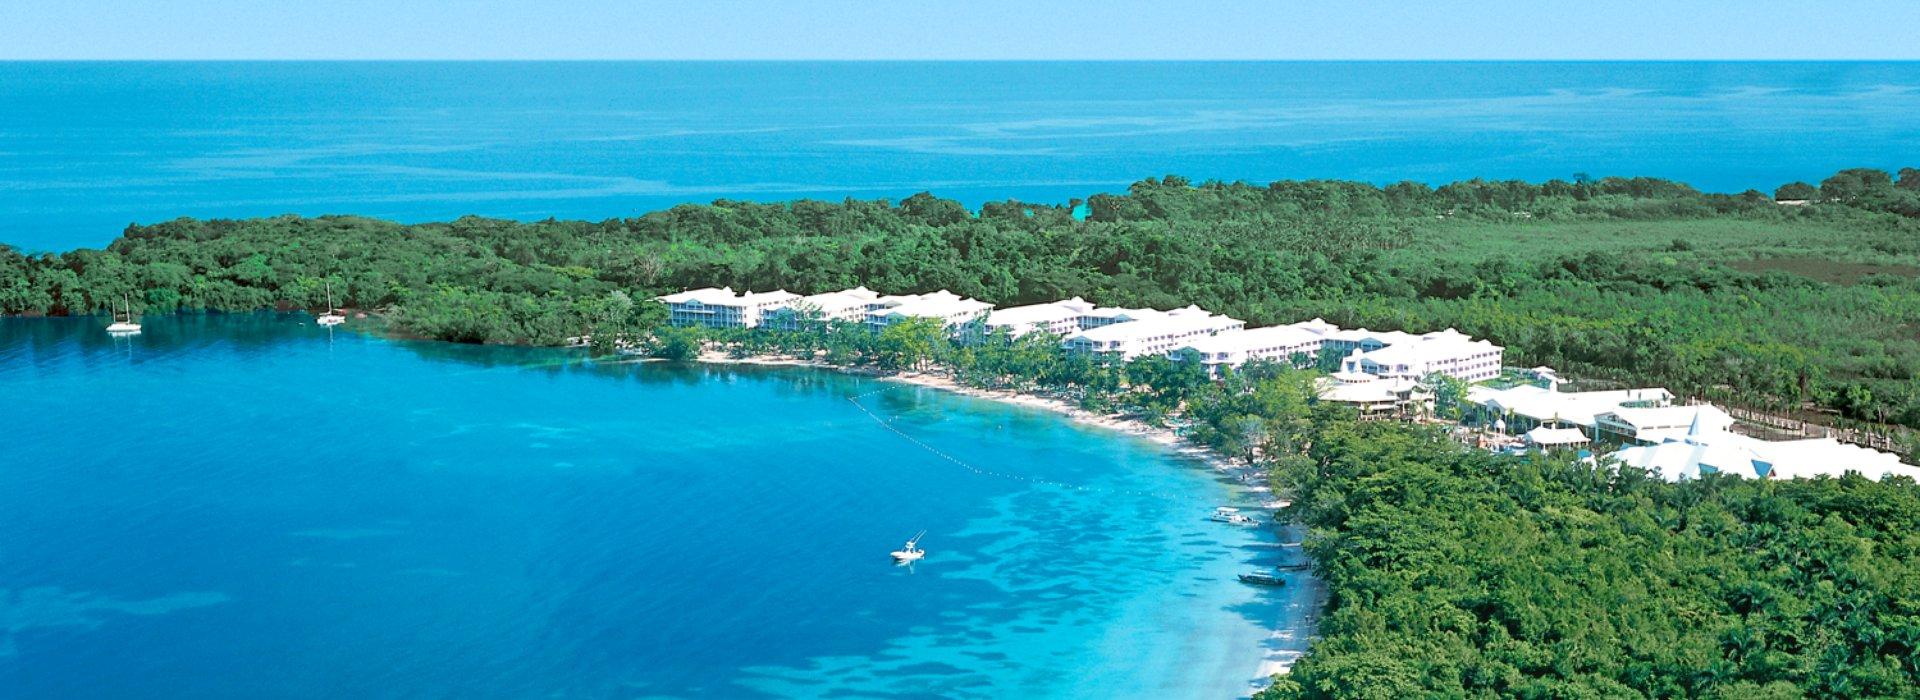 RIU Clubhotel Negril Jamaika